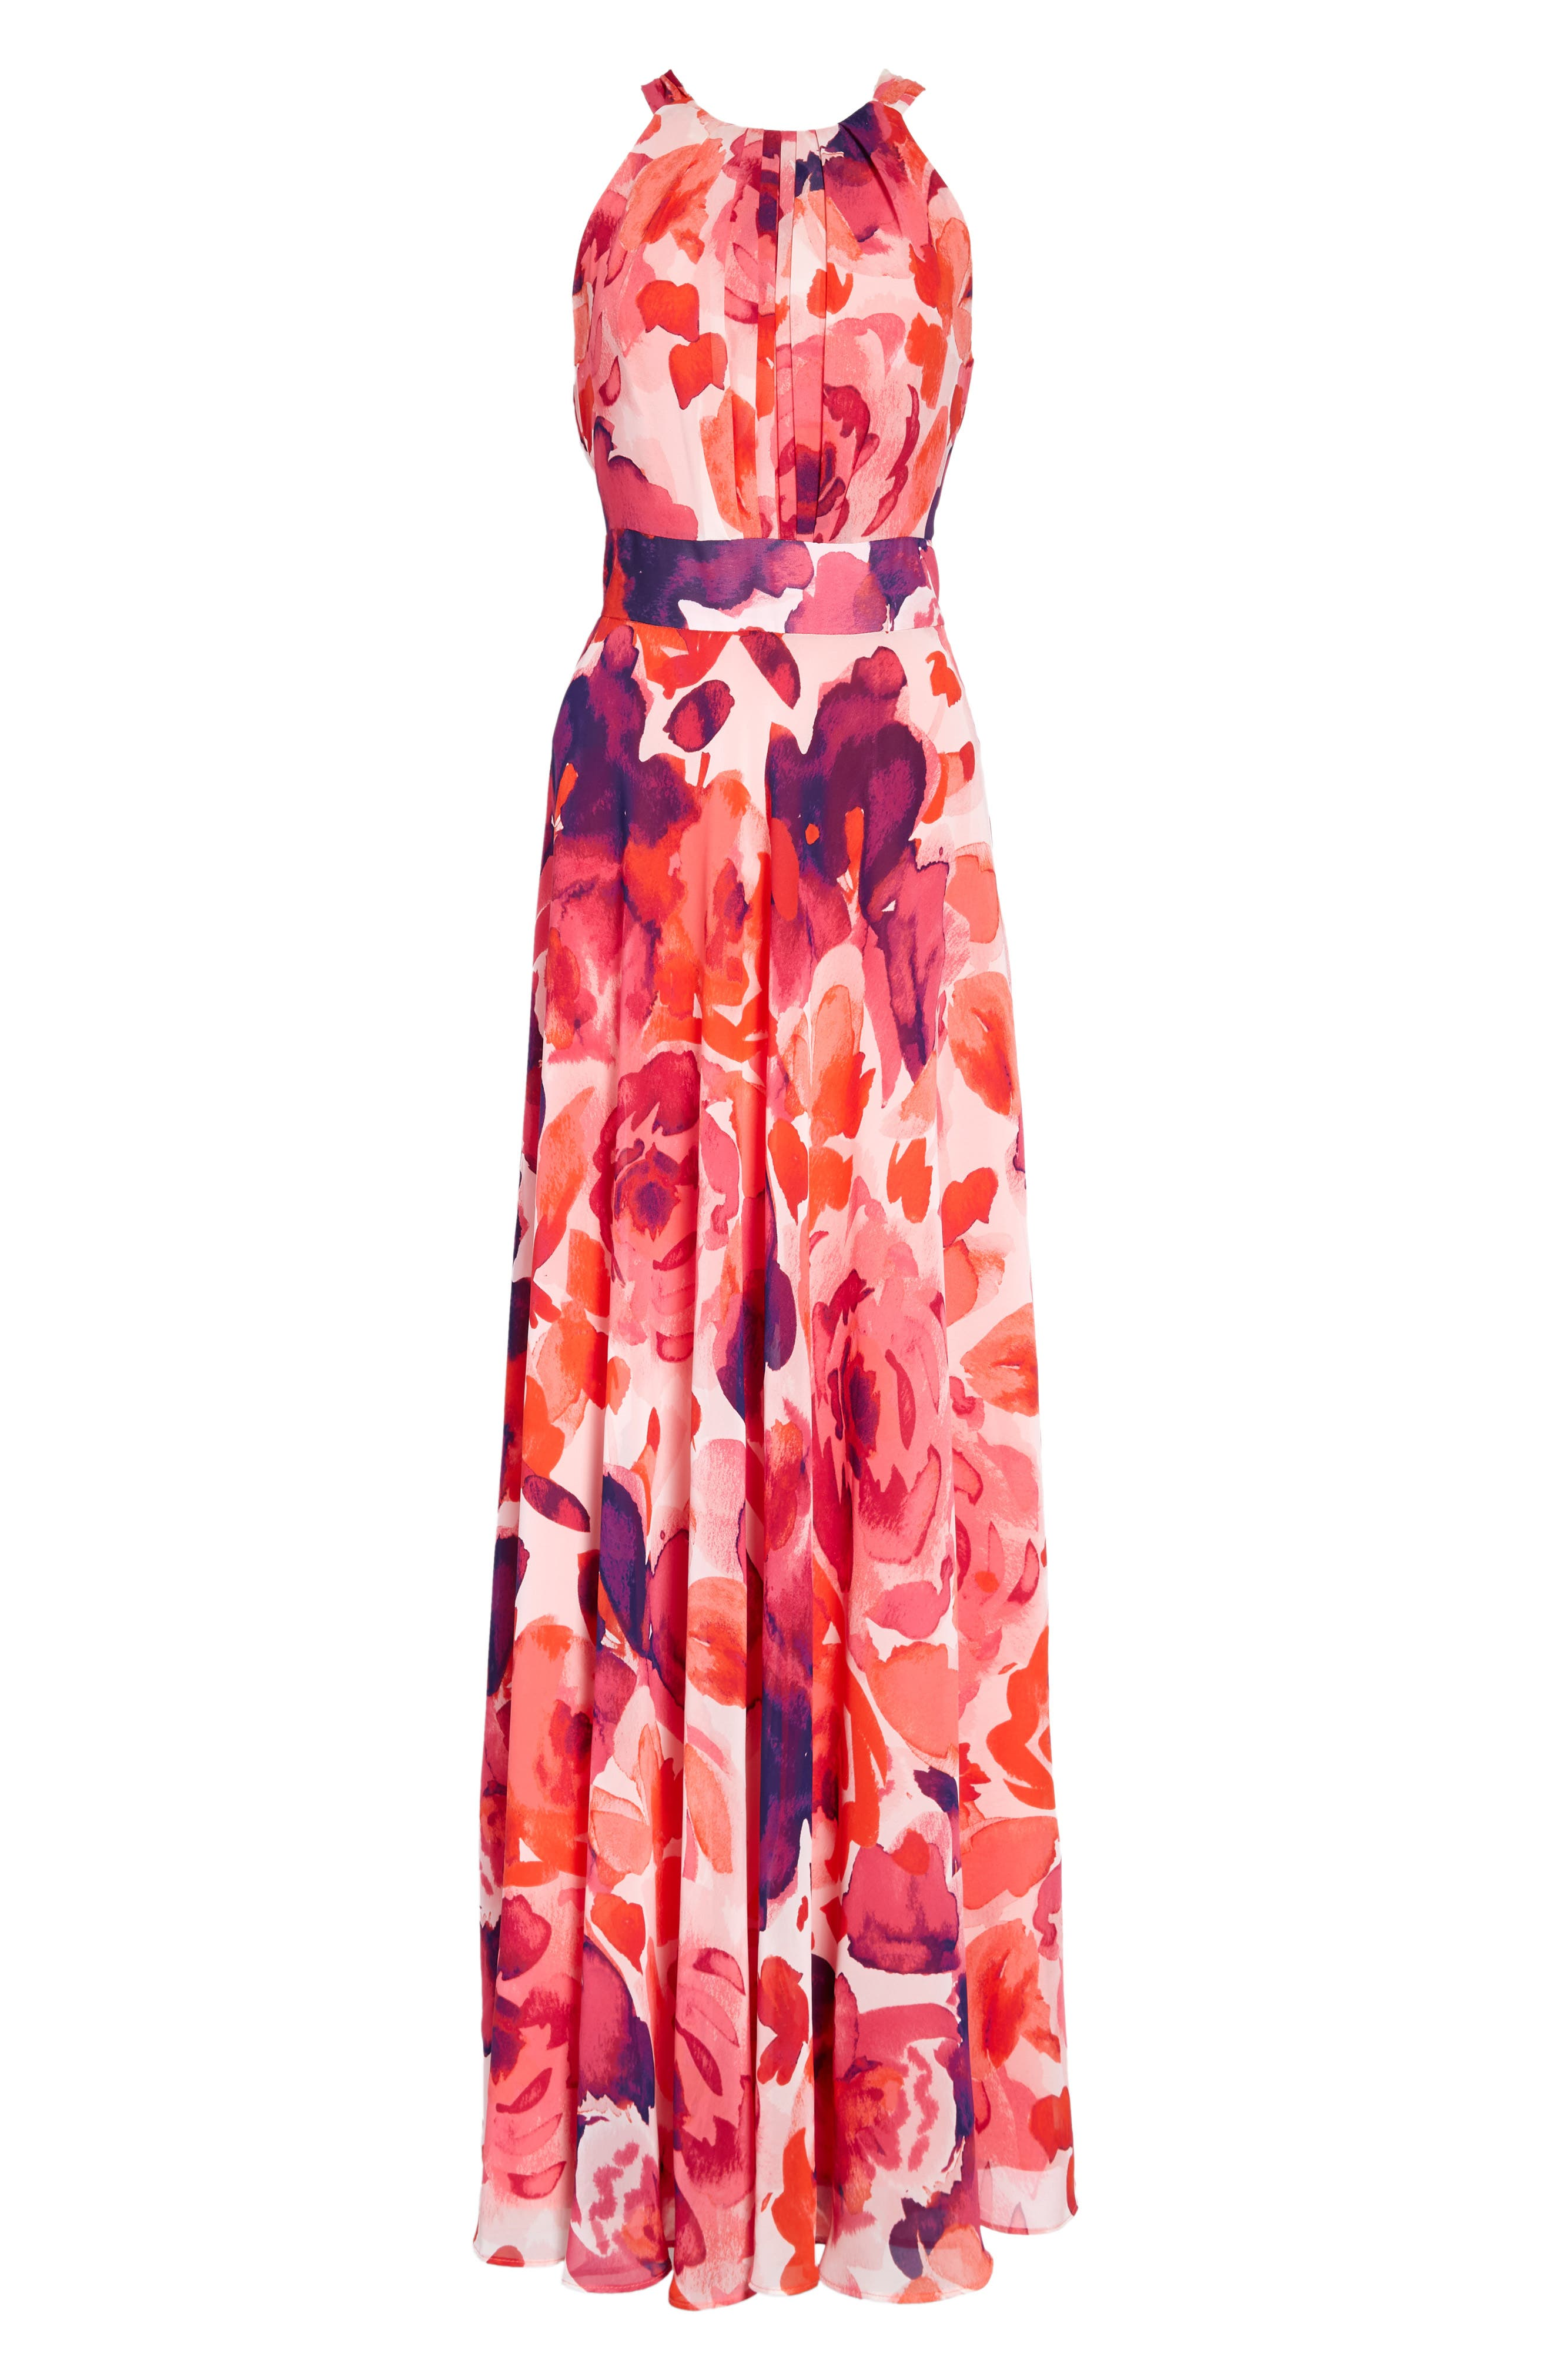 70s Dresses – Disco Dress, Hippie Dress, Wrap Dress Womens Eliza J Floral Print Halter Maxi Dress Size 10 - Pink $158.00 AT vintagedancer.com